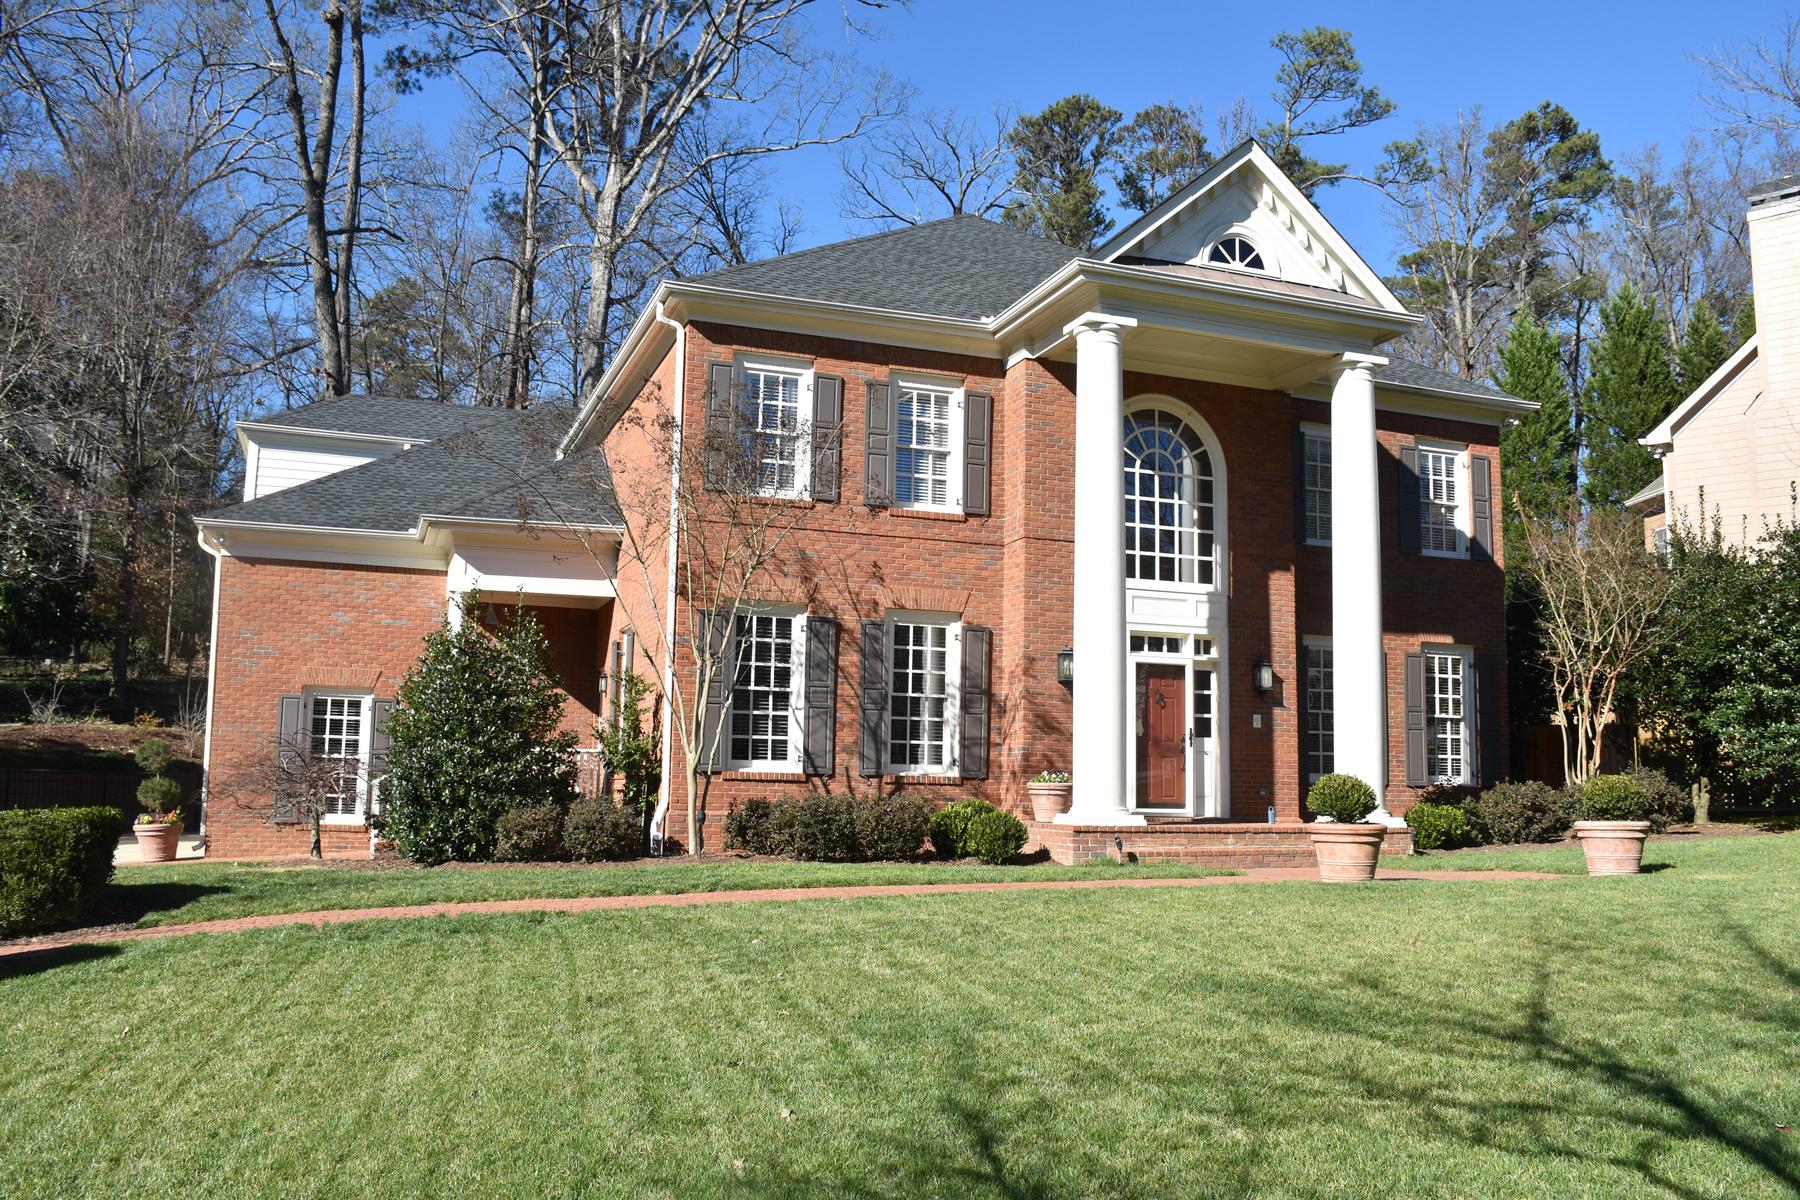 Single Family Home for Sale at Immaculate Home Near Westminster 1321 Twelve Oaks Circle Buckhead, Atlanta, Georgia 30327 United States